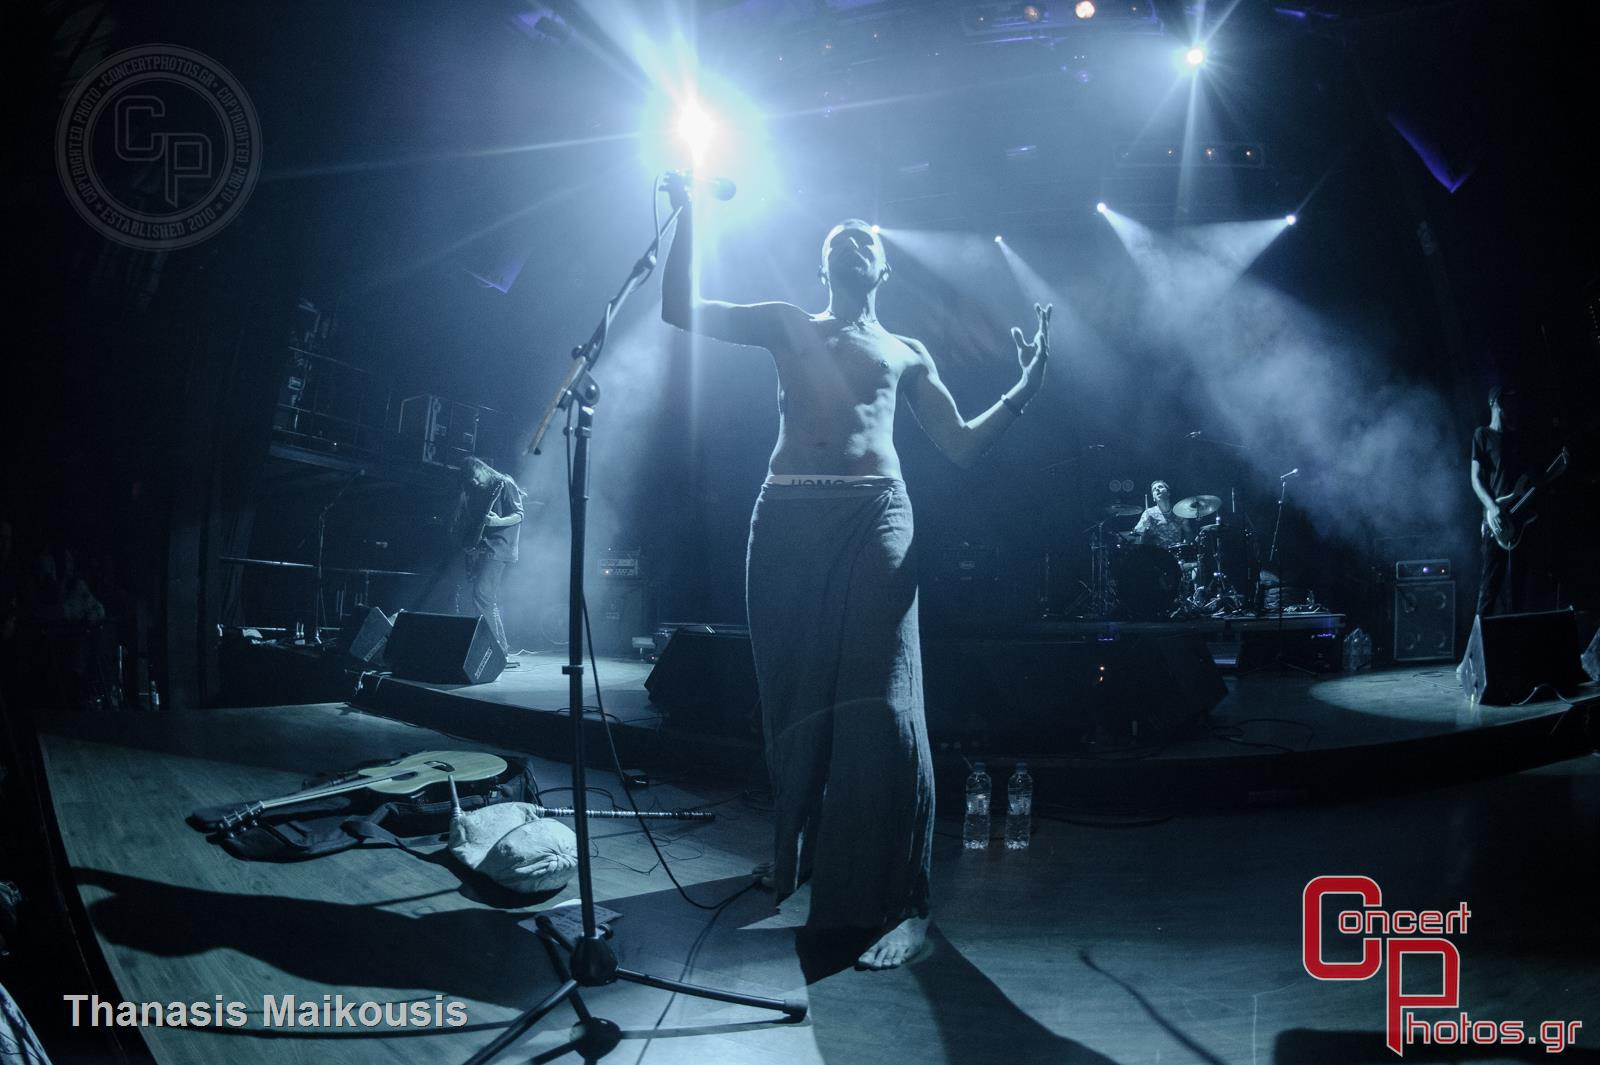 Villagers Of Ioannina City (V.I.C.) & Smallman-Villagers Of Ioannina City (V.I.C.) Smallman photographer: Thanasis Maikousis - concertphotos_20141115_22_19_17